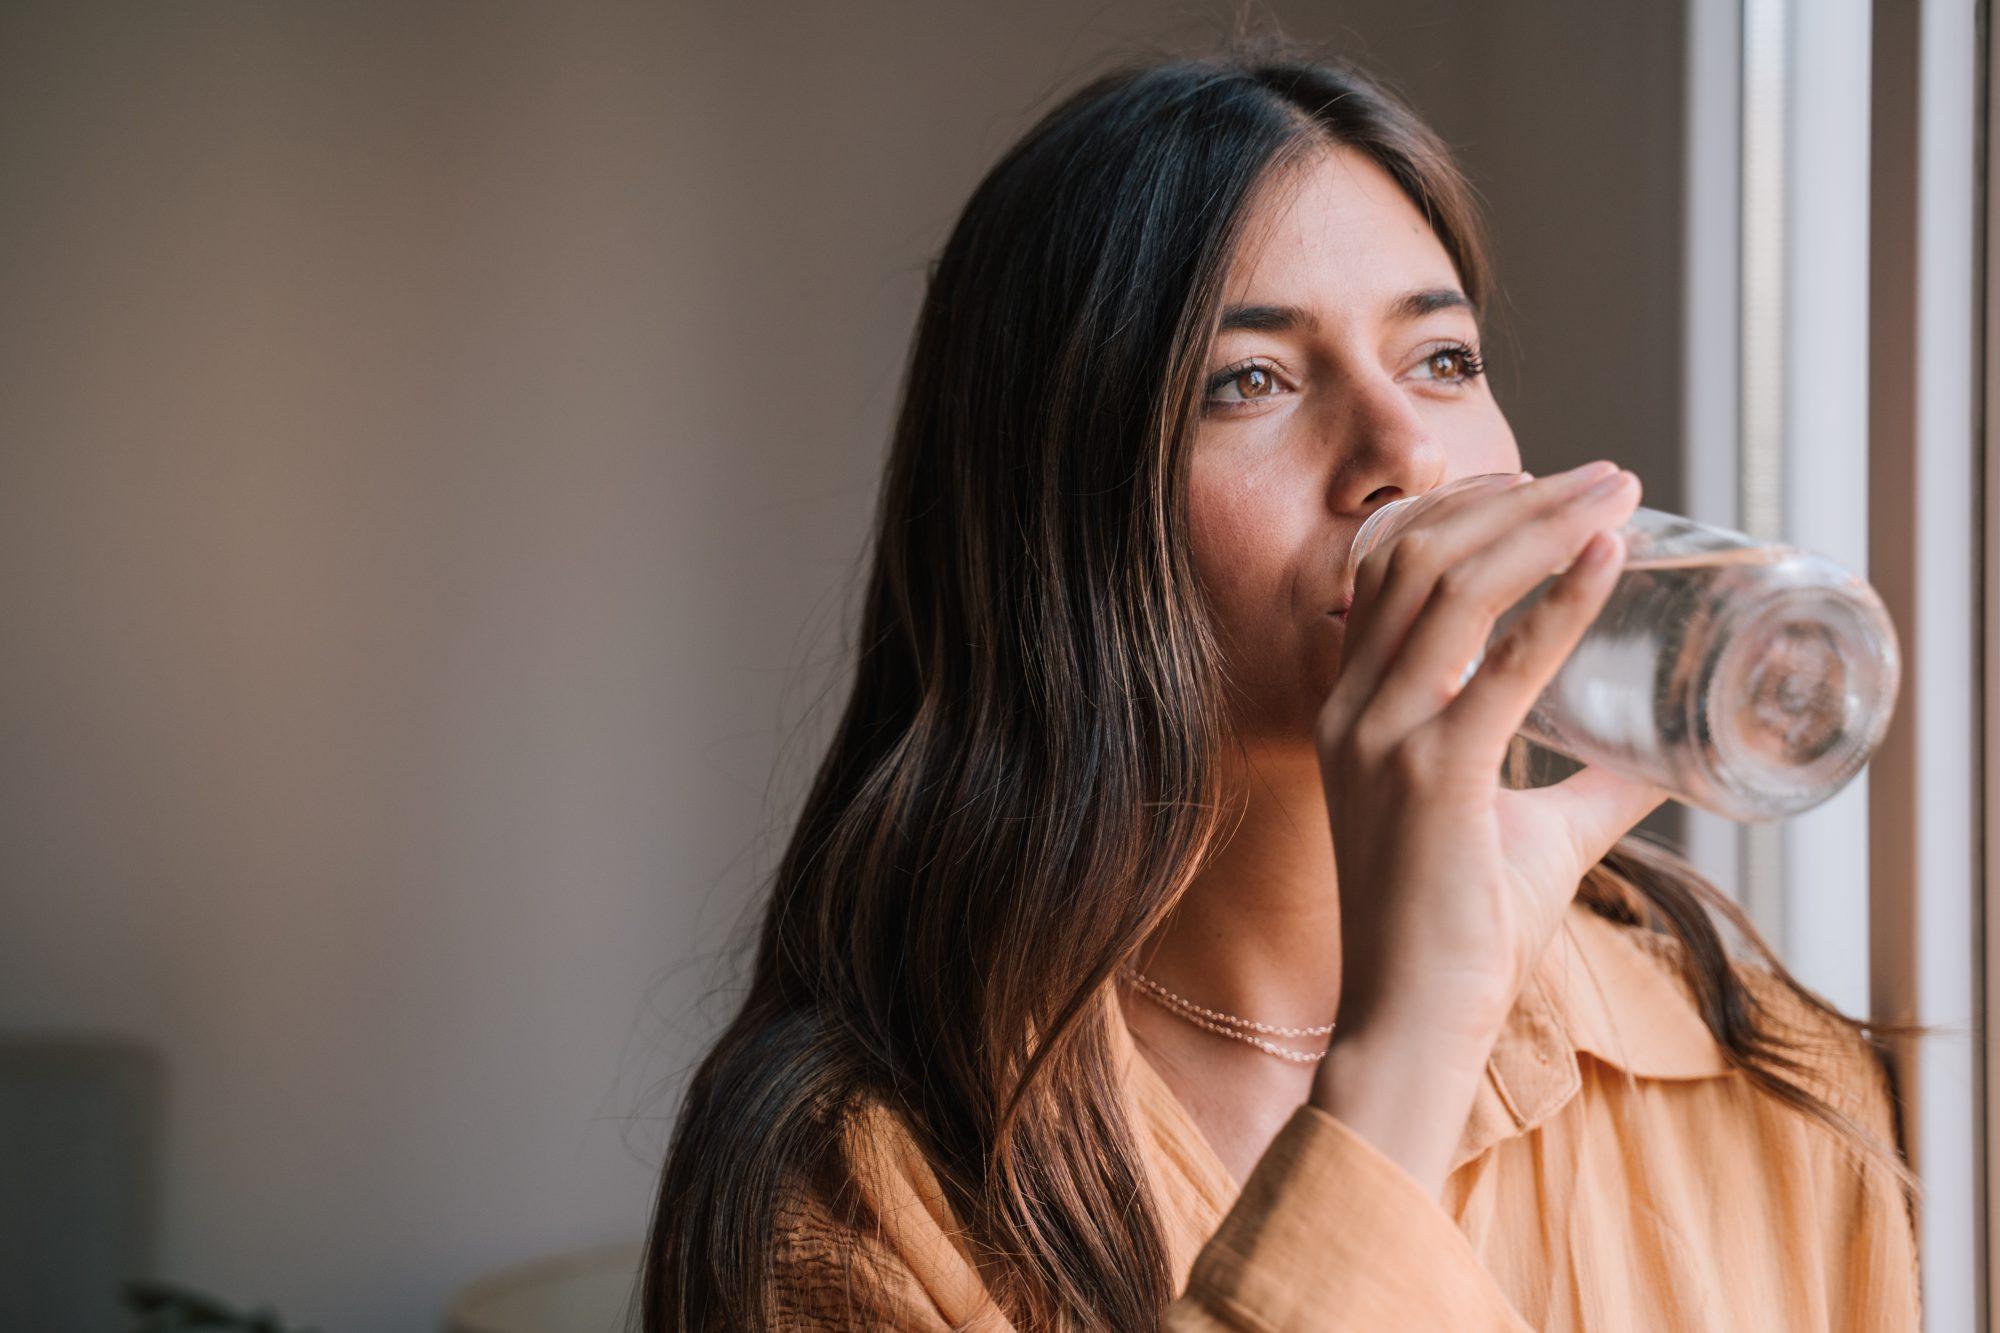 Drinking water Getty 7/6/20